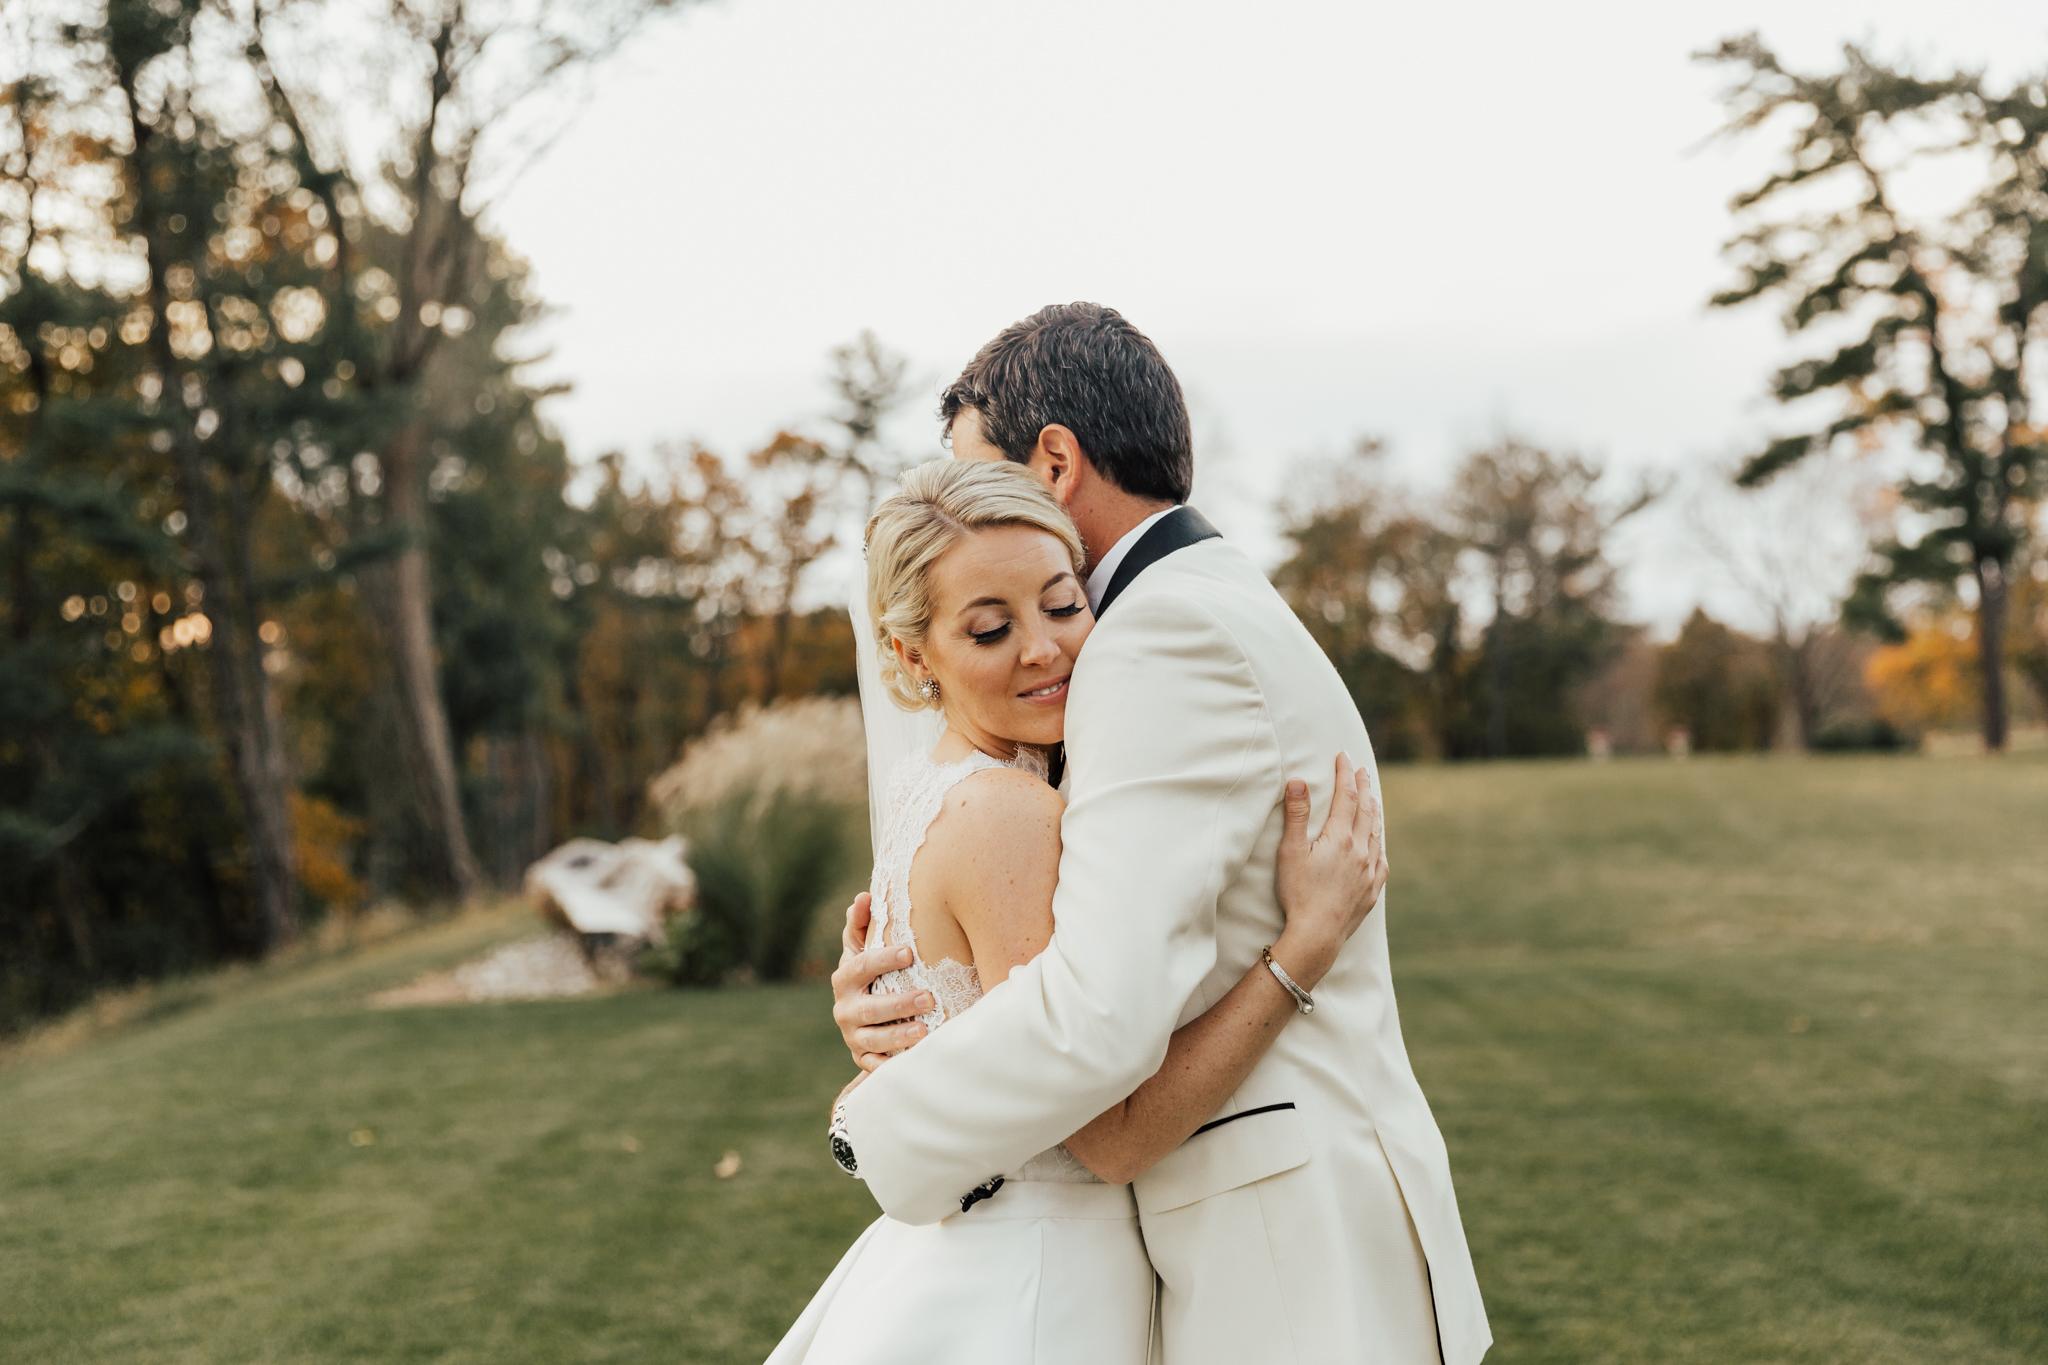 intimate wedding photographers nyc